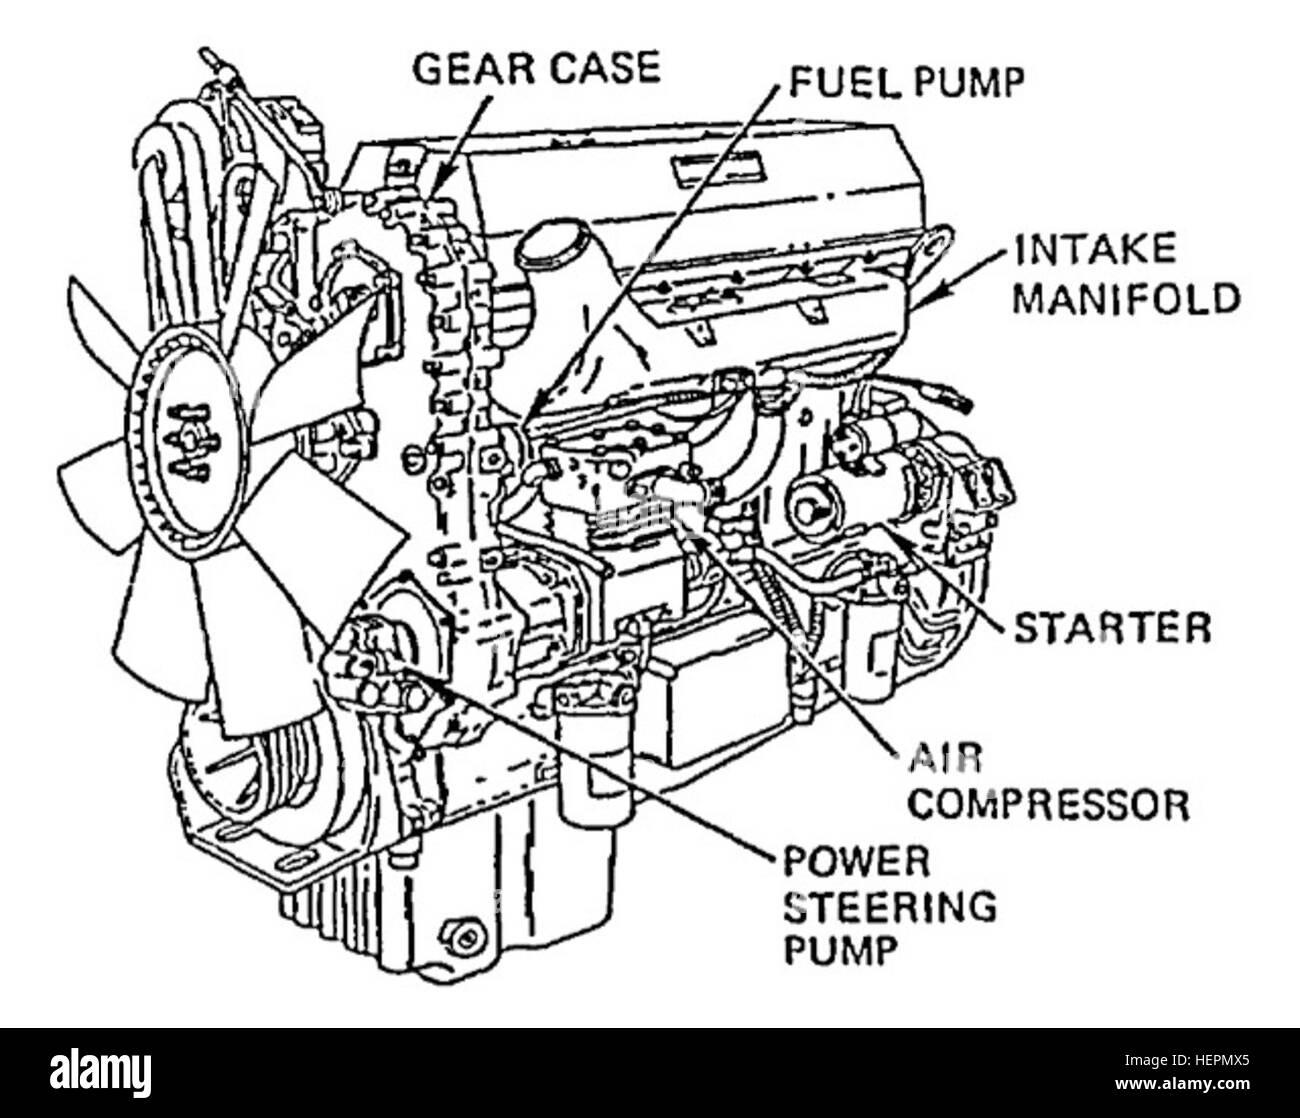 hight resolution of detroit 60 engine diagram wiring diagram advance detroit series 60 engine fan wiring diagram detroit 60 engine diagram